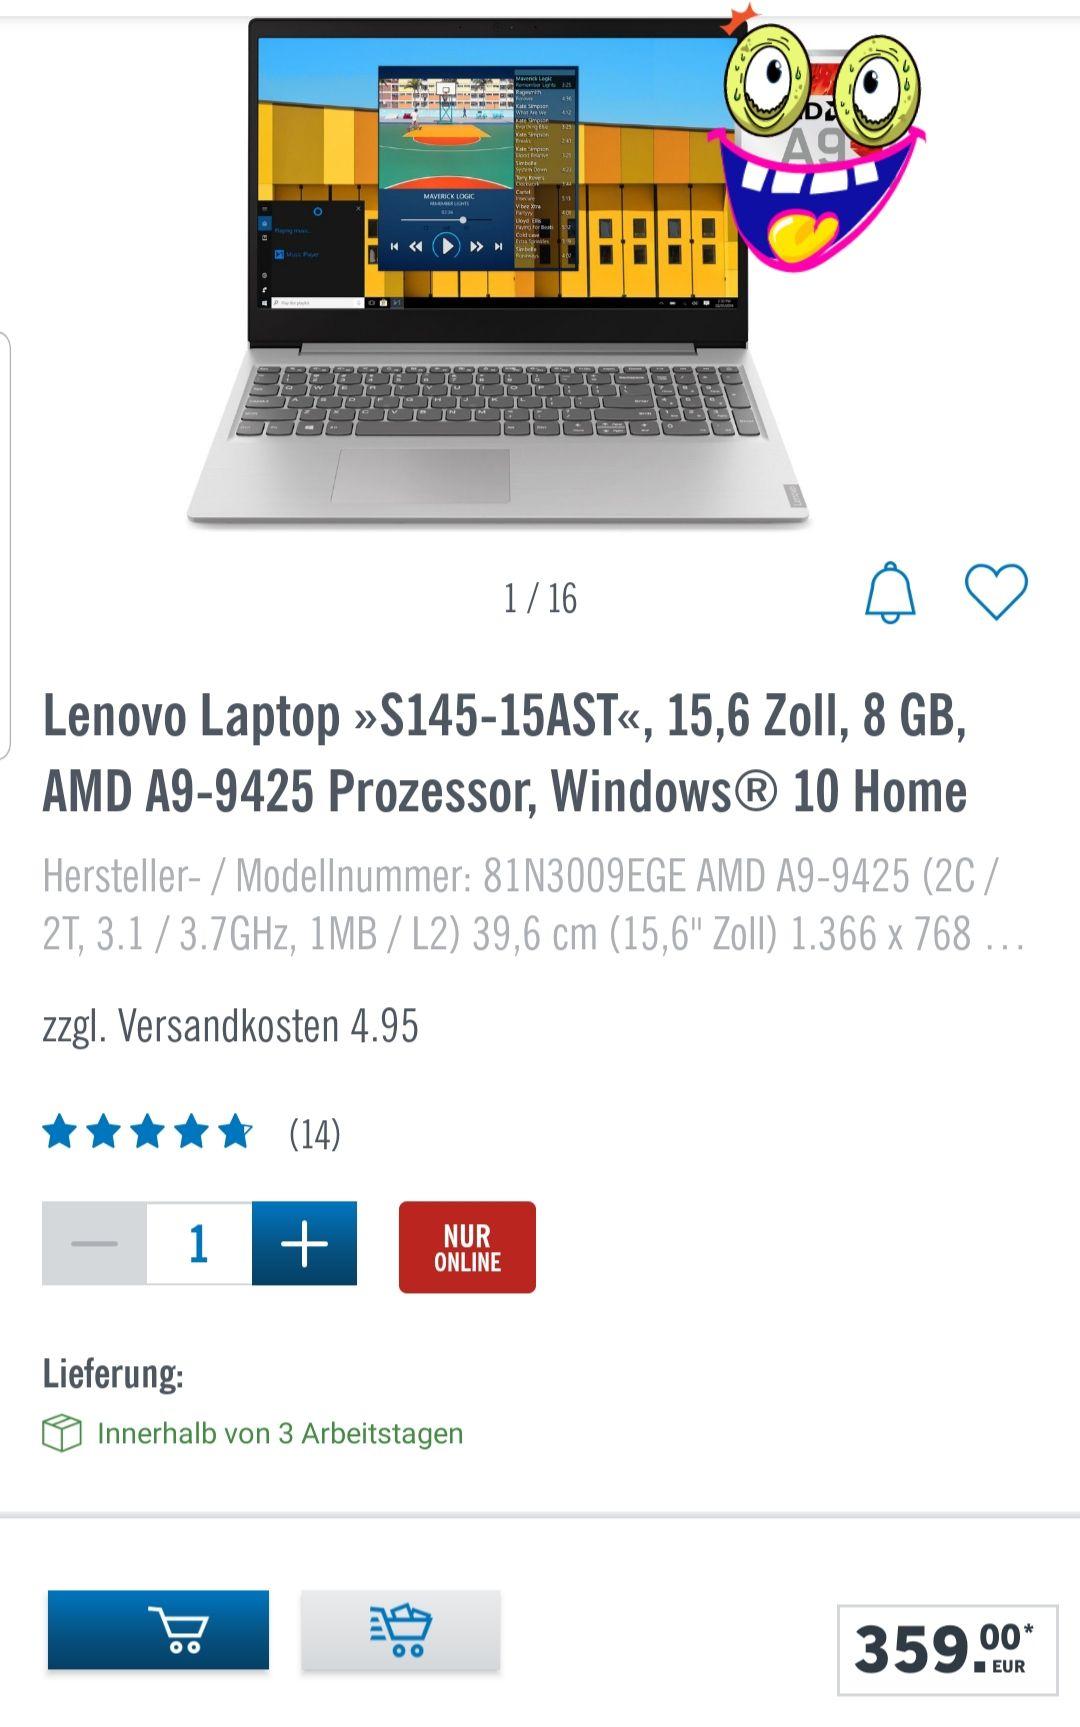 LIDL Lenovo Laptop